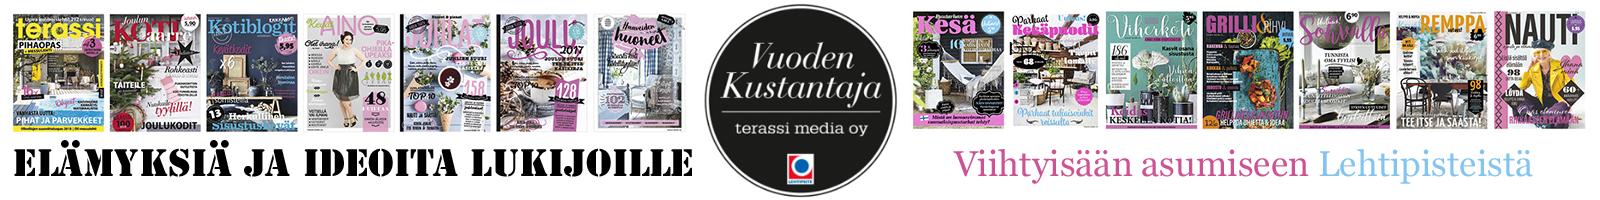 Terassi media